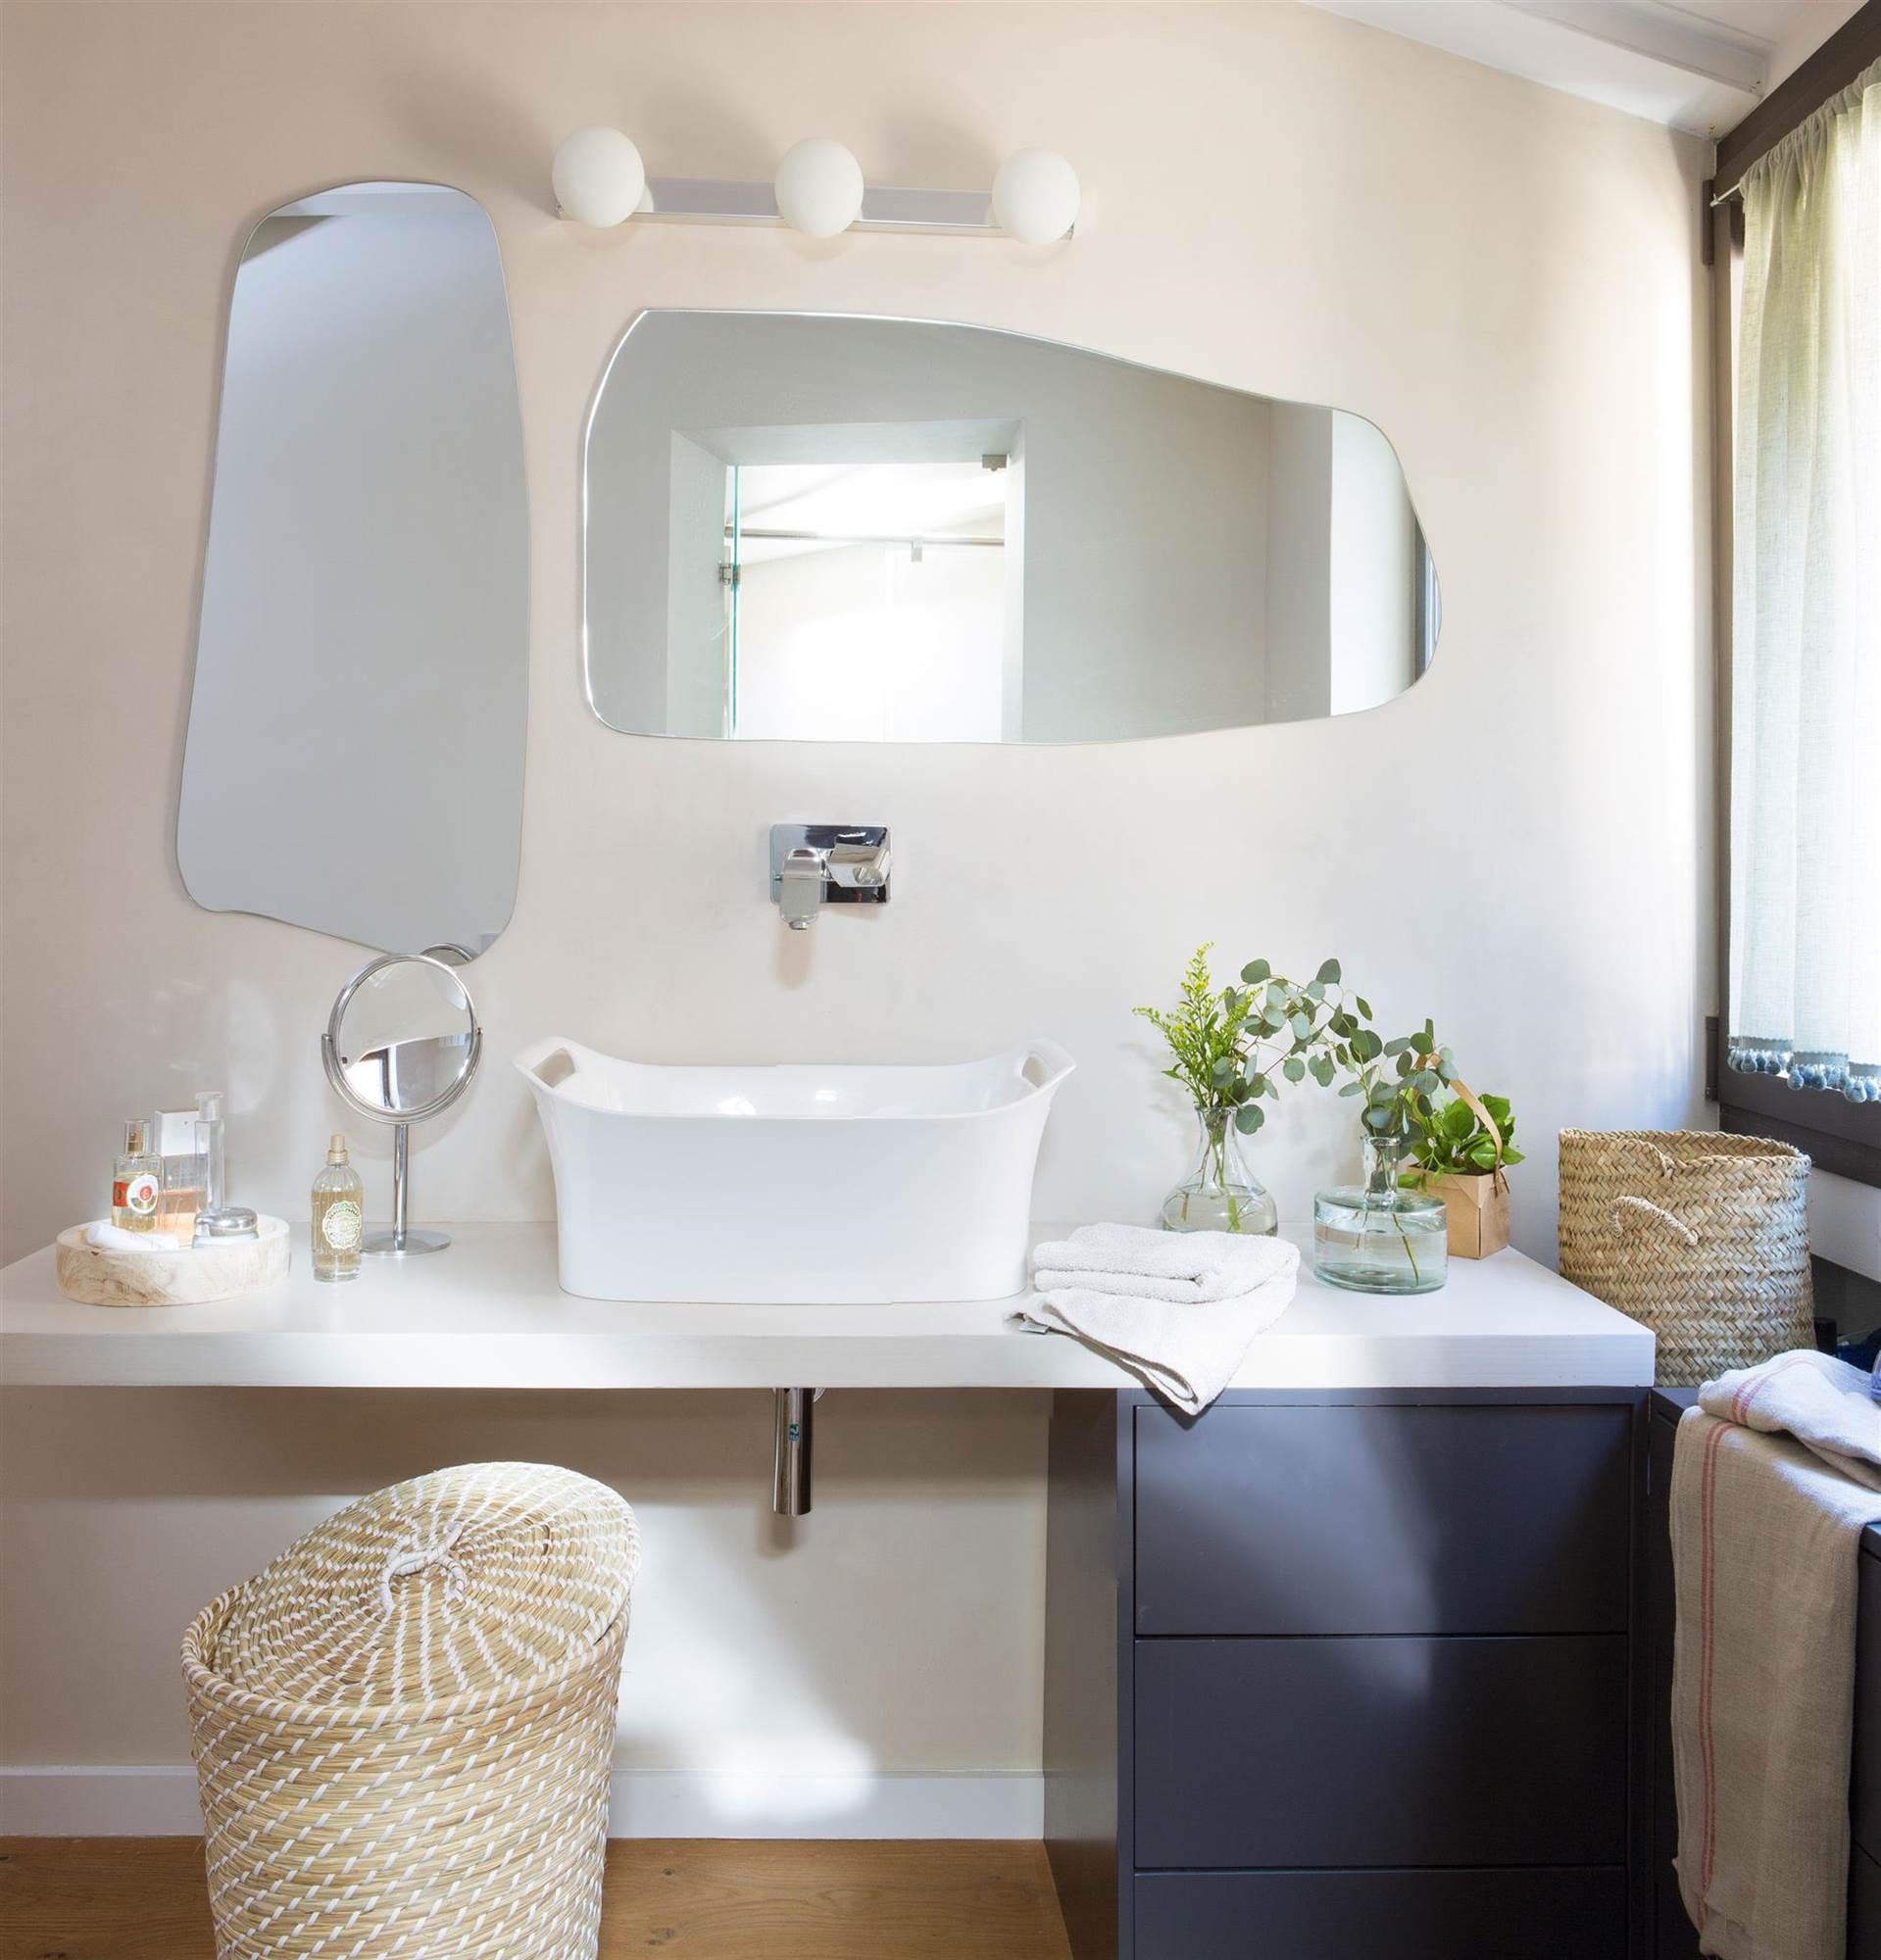 Espejos decorativos for Espejos biselados para comedor